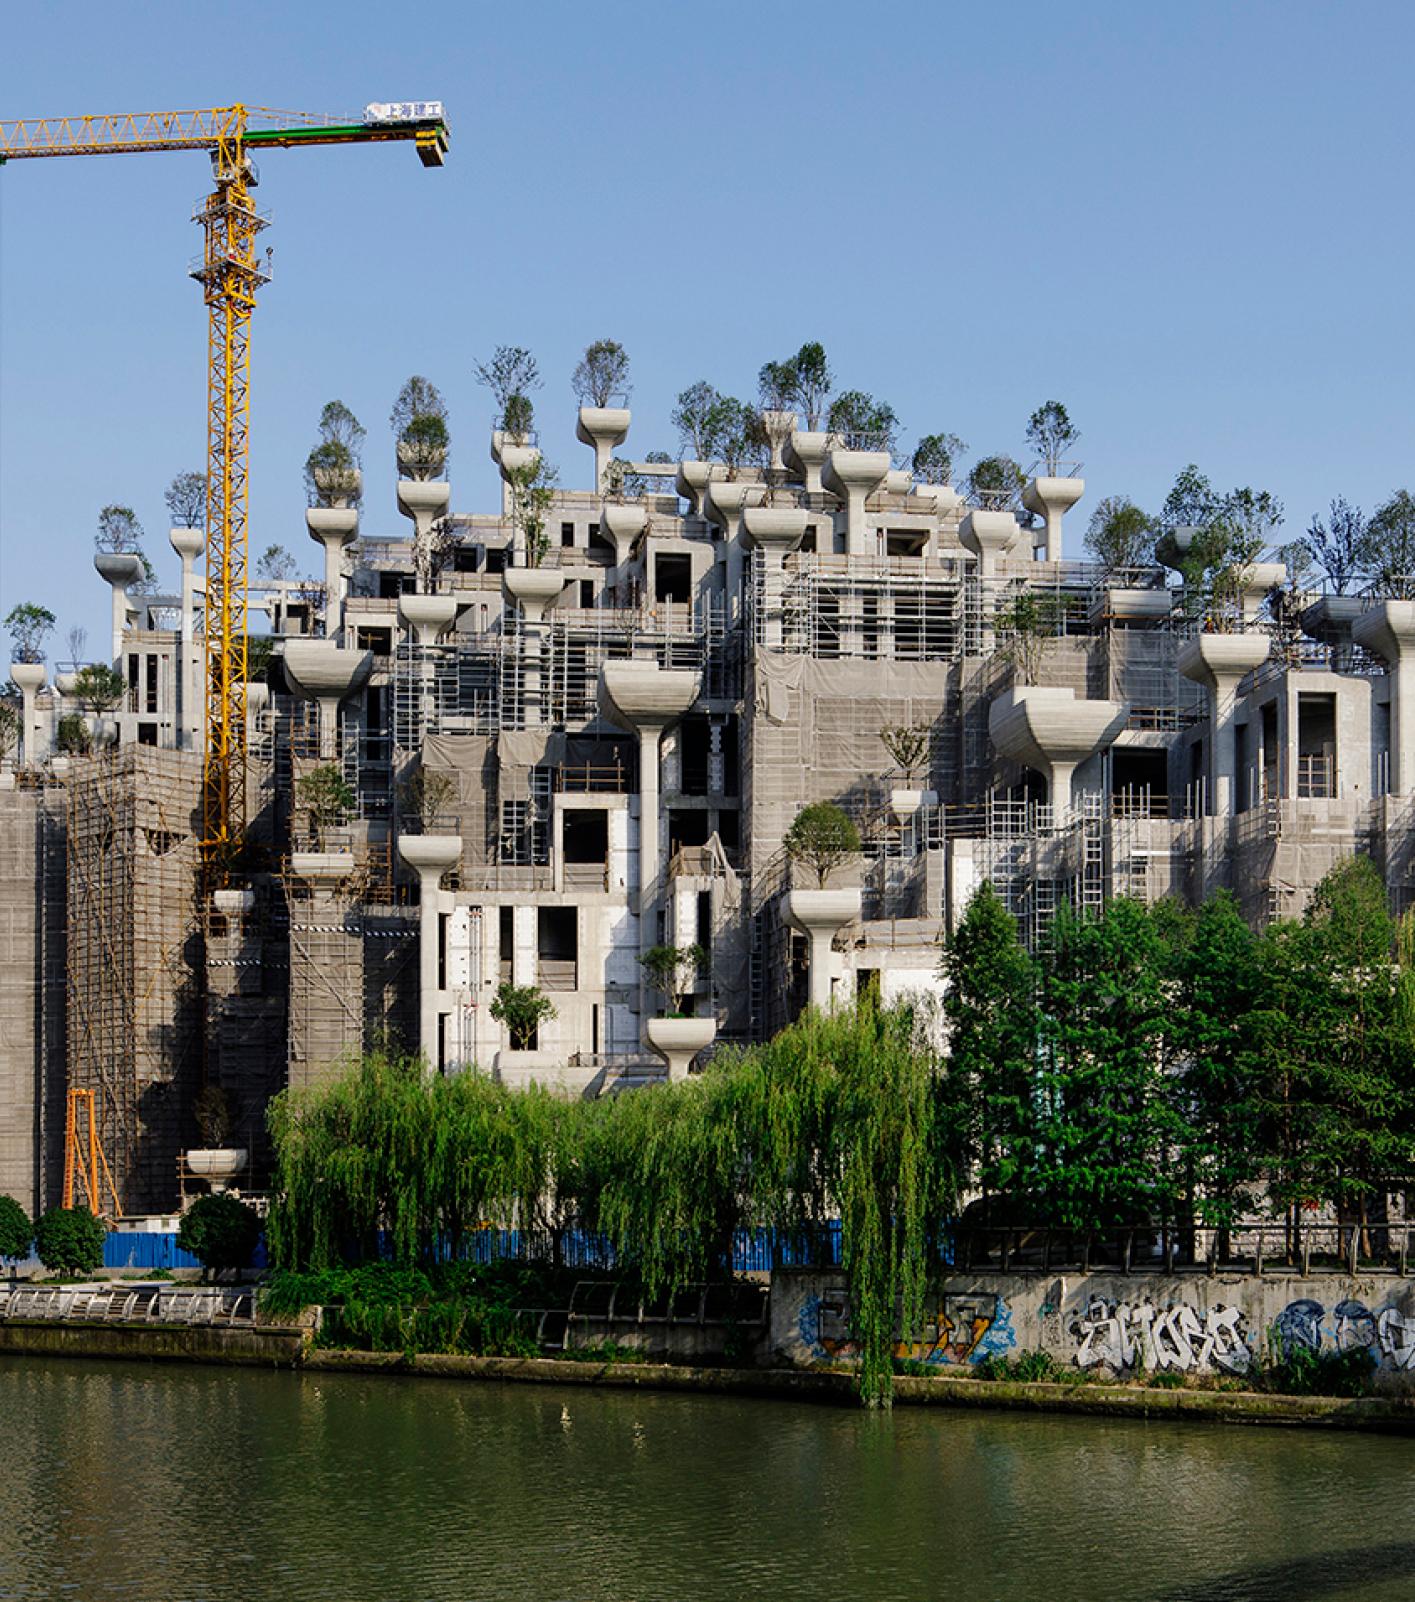 Heatherwick Studios' 1000 Trees complex in Shanghai